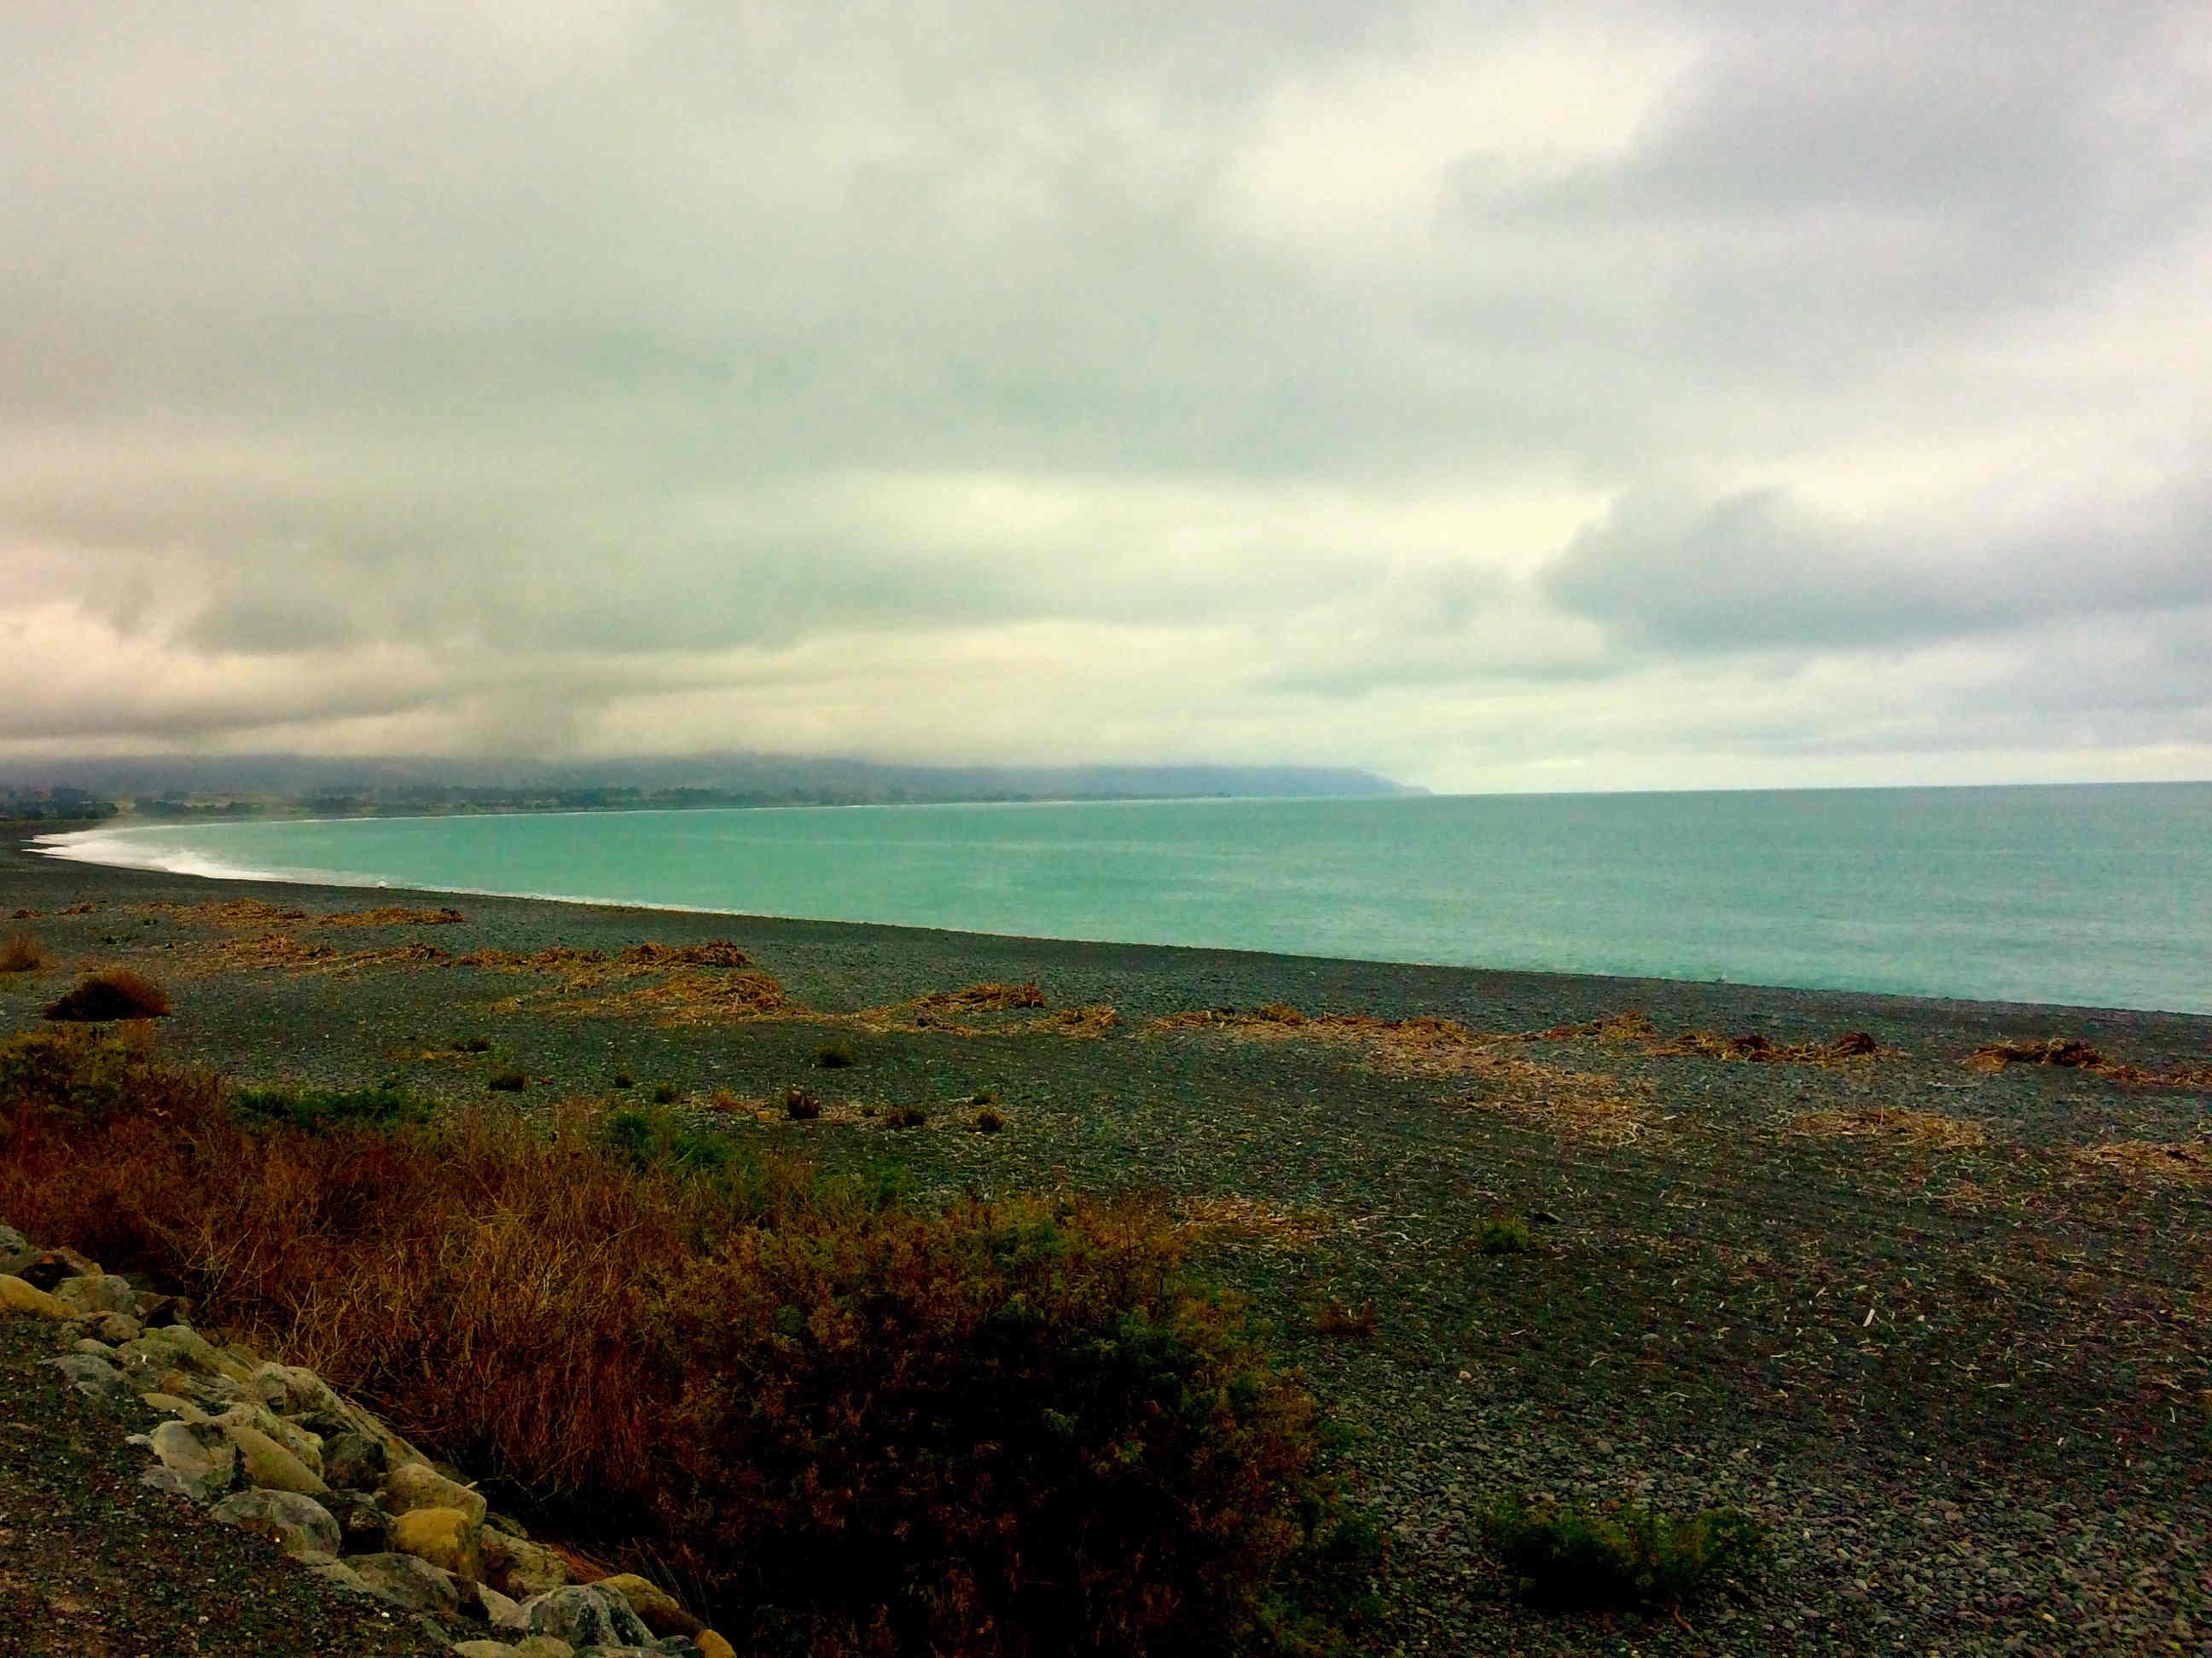 Kaikoura - New Zealand - Itinerary Planner